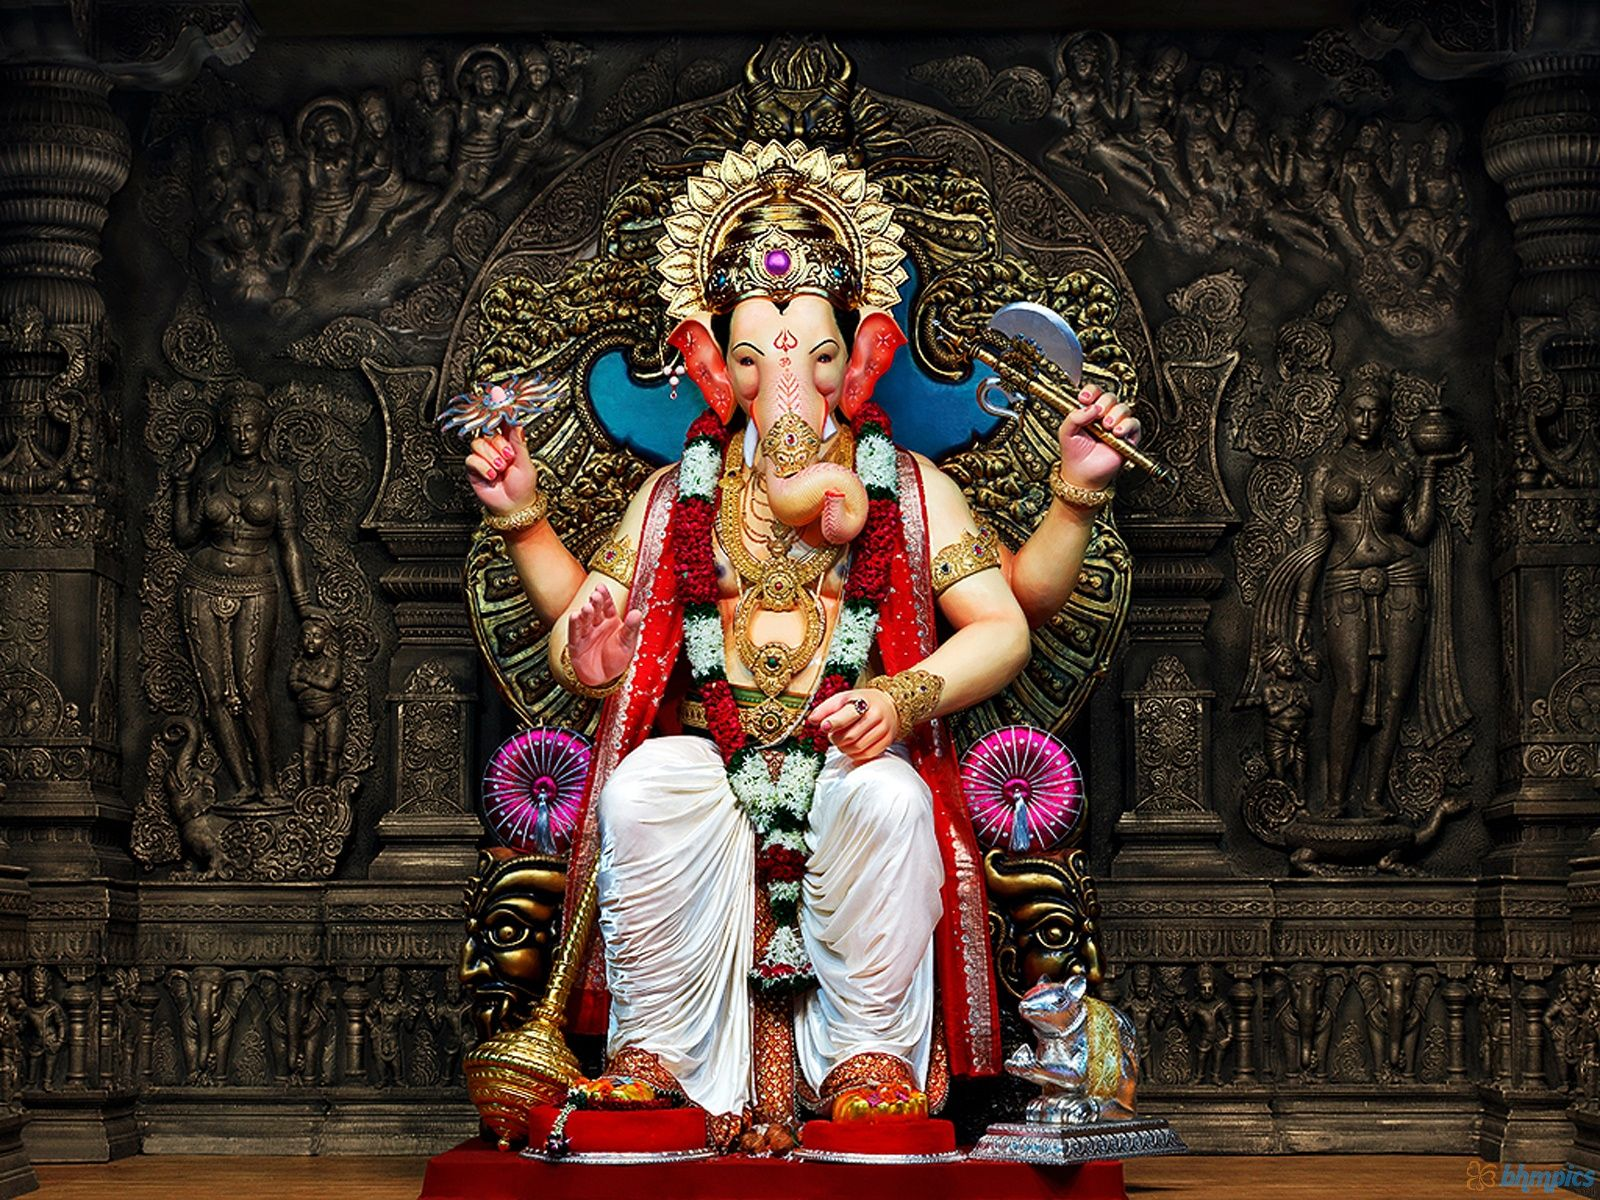 Hd wallpaper ganesh ji - Lord Ganesha Hd Wallpaper For Desktop Wallpaper